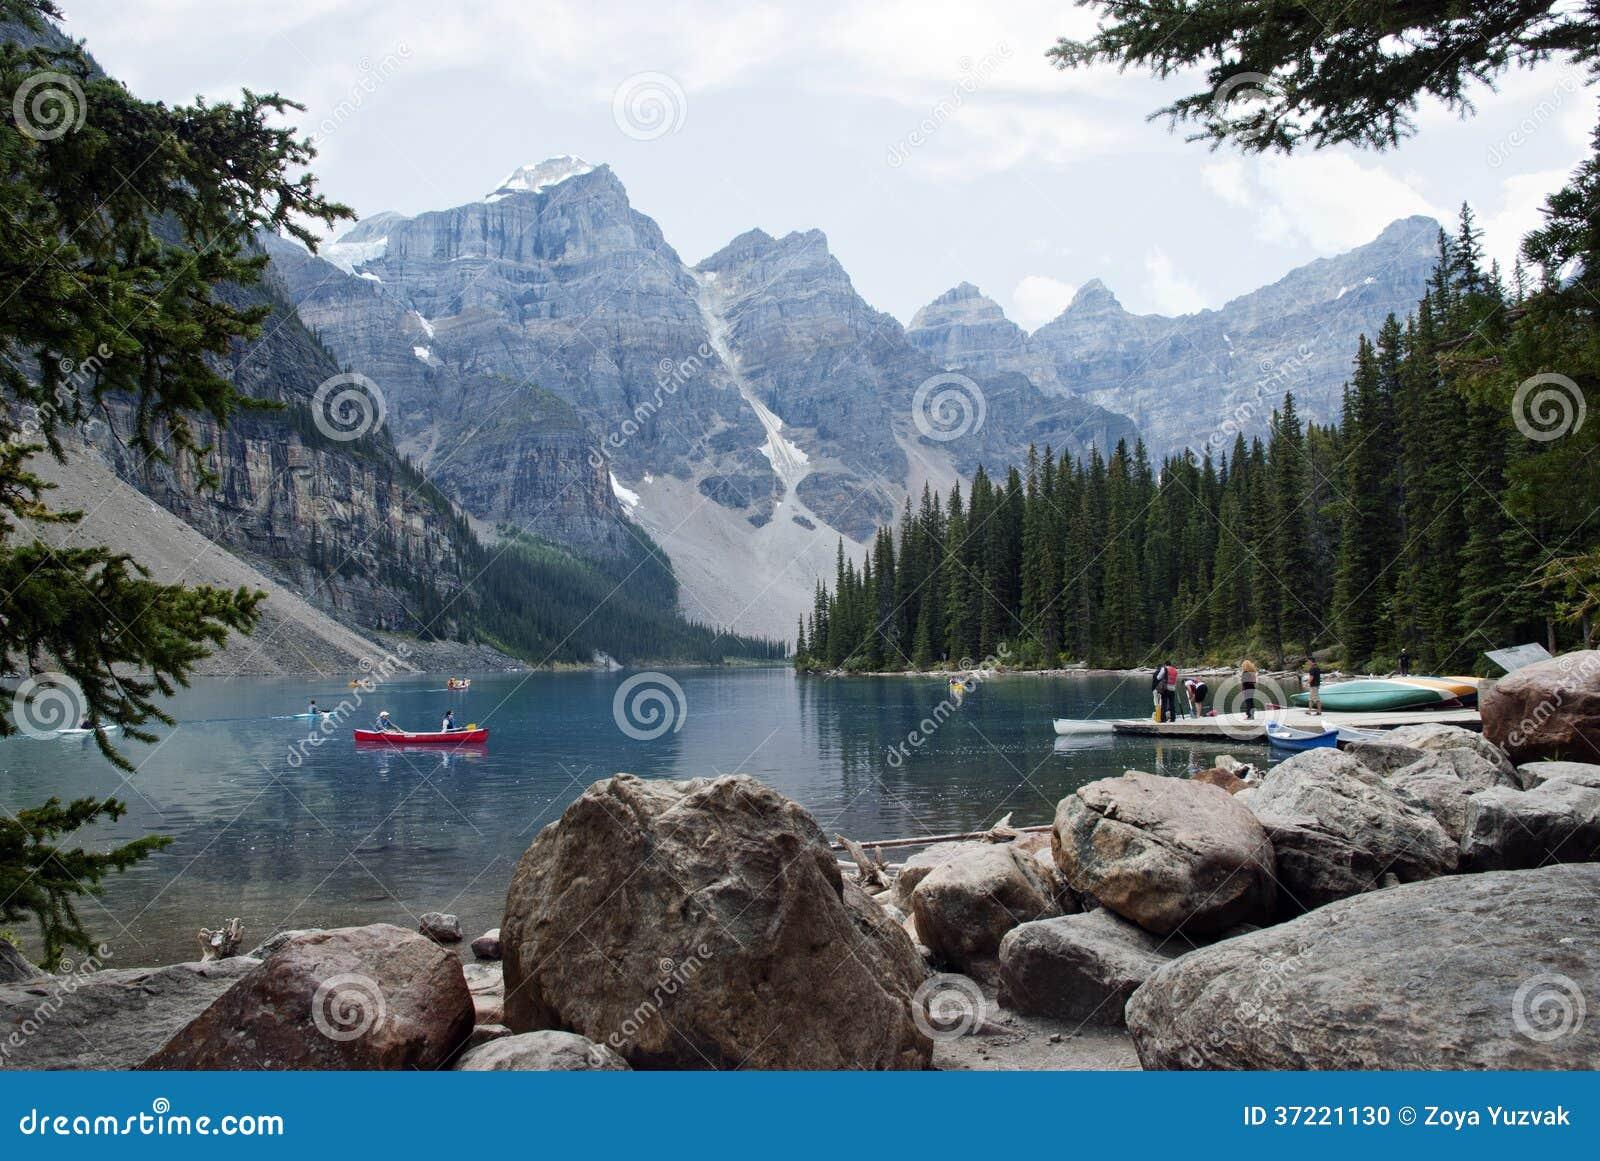 Morena jeziora, Banff park narodowy, Alberta, Kanada